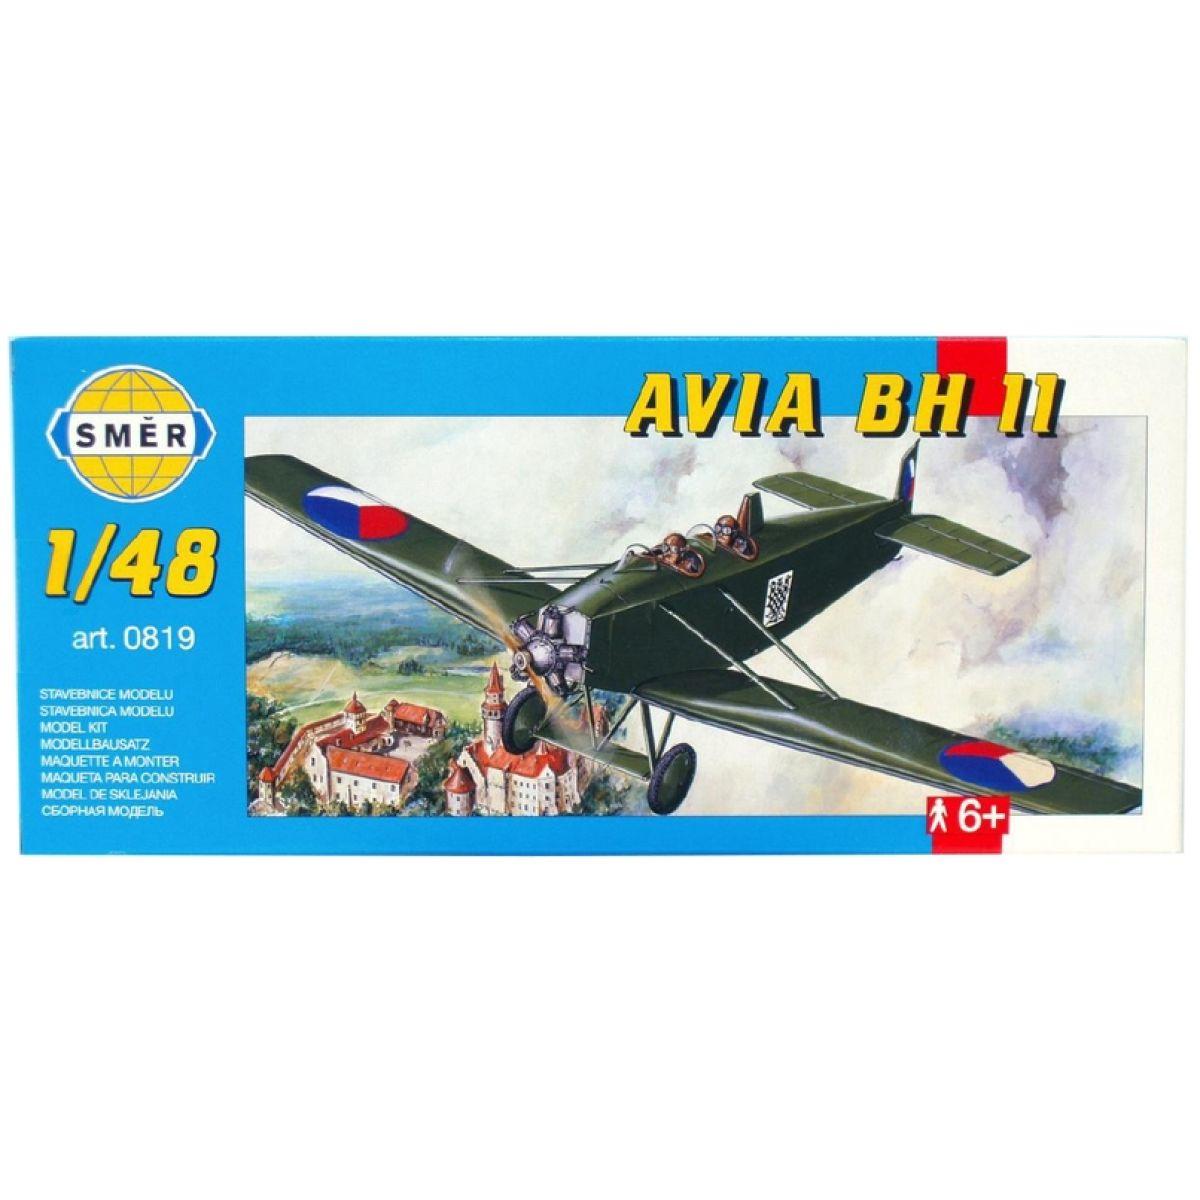 Směr Model Avia BH 11